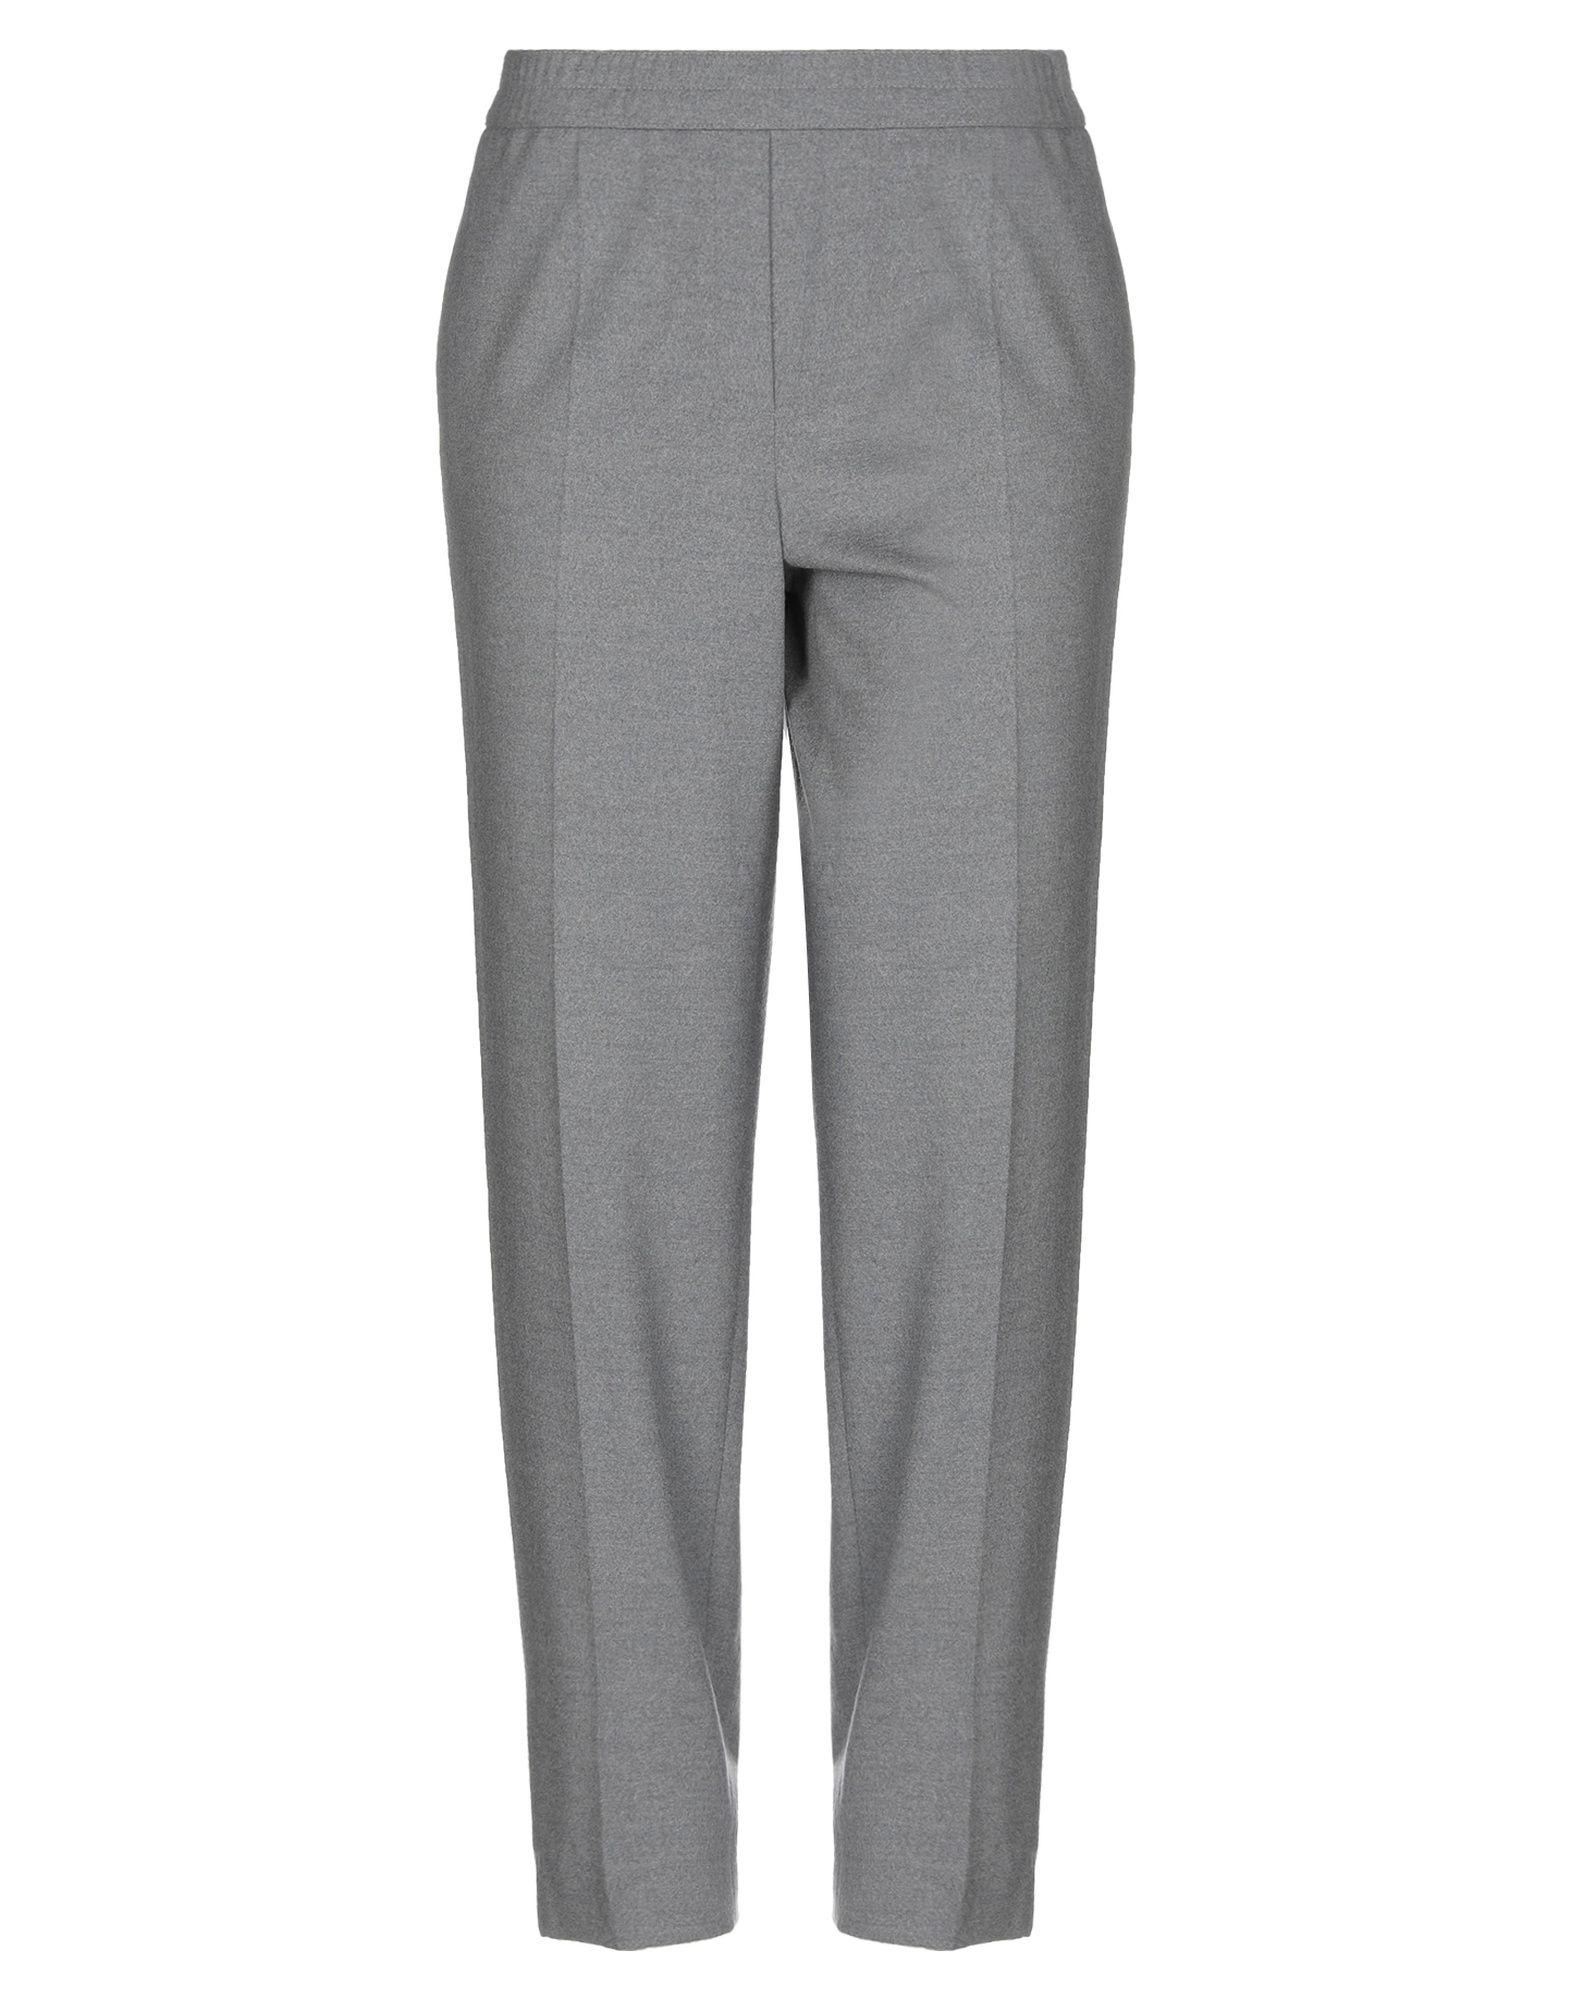 LUISA CERANO Повседневные брюки брюки luisa spagnoli брюки